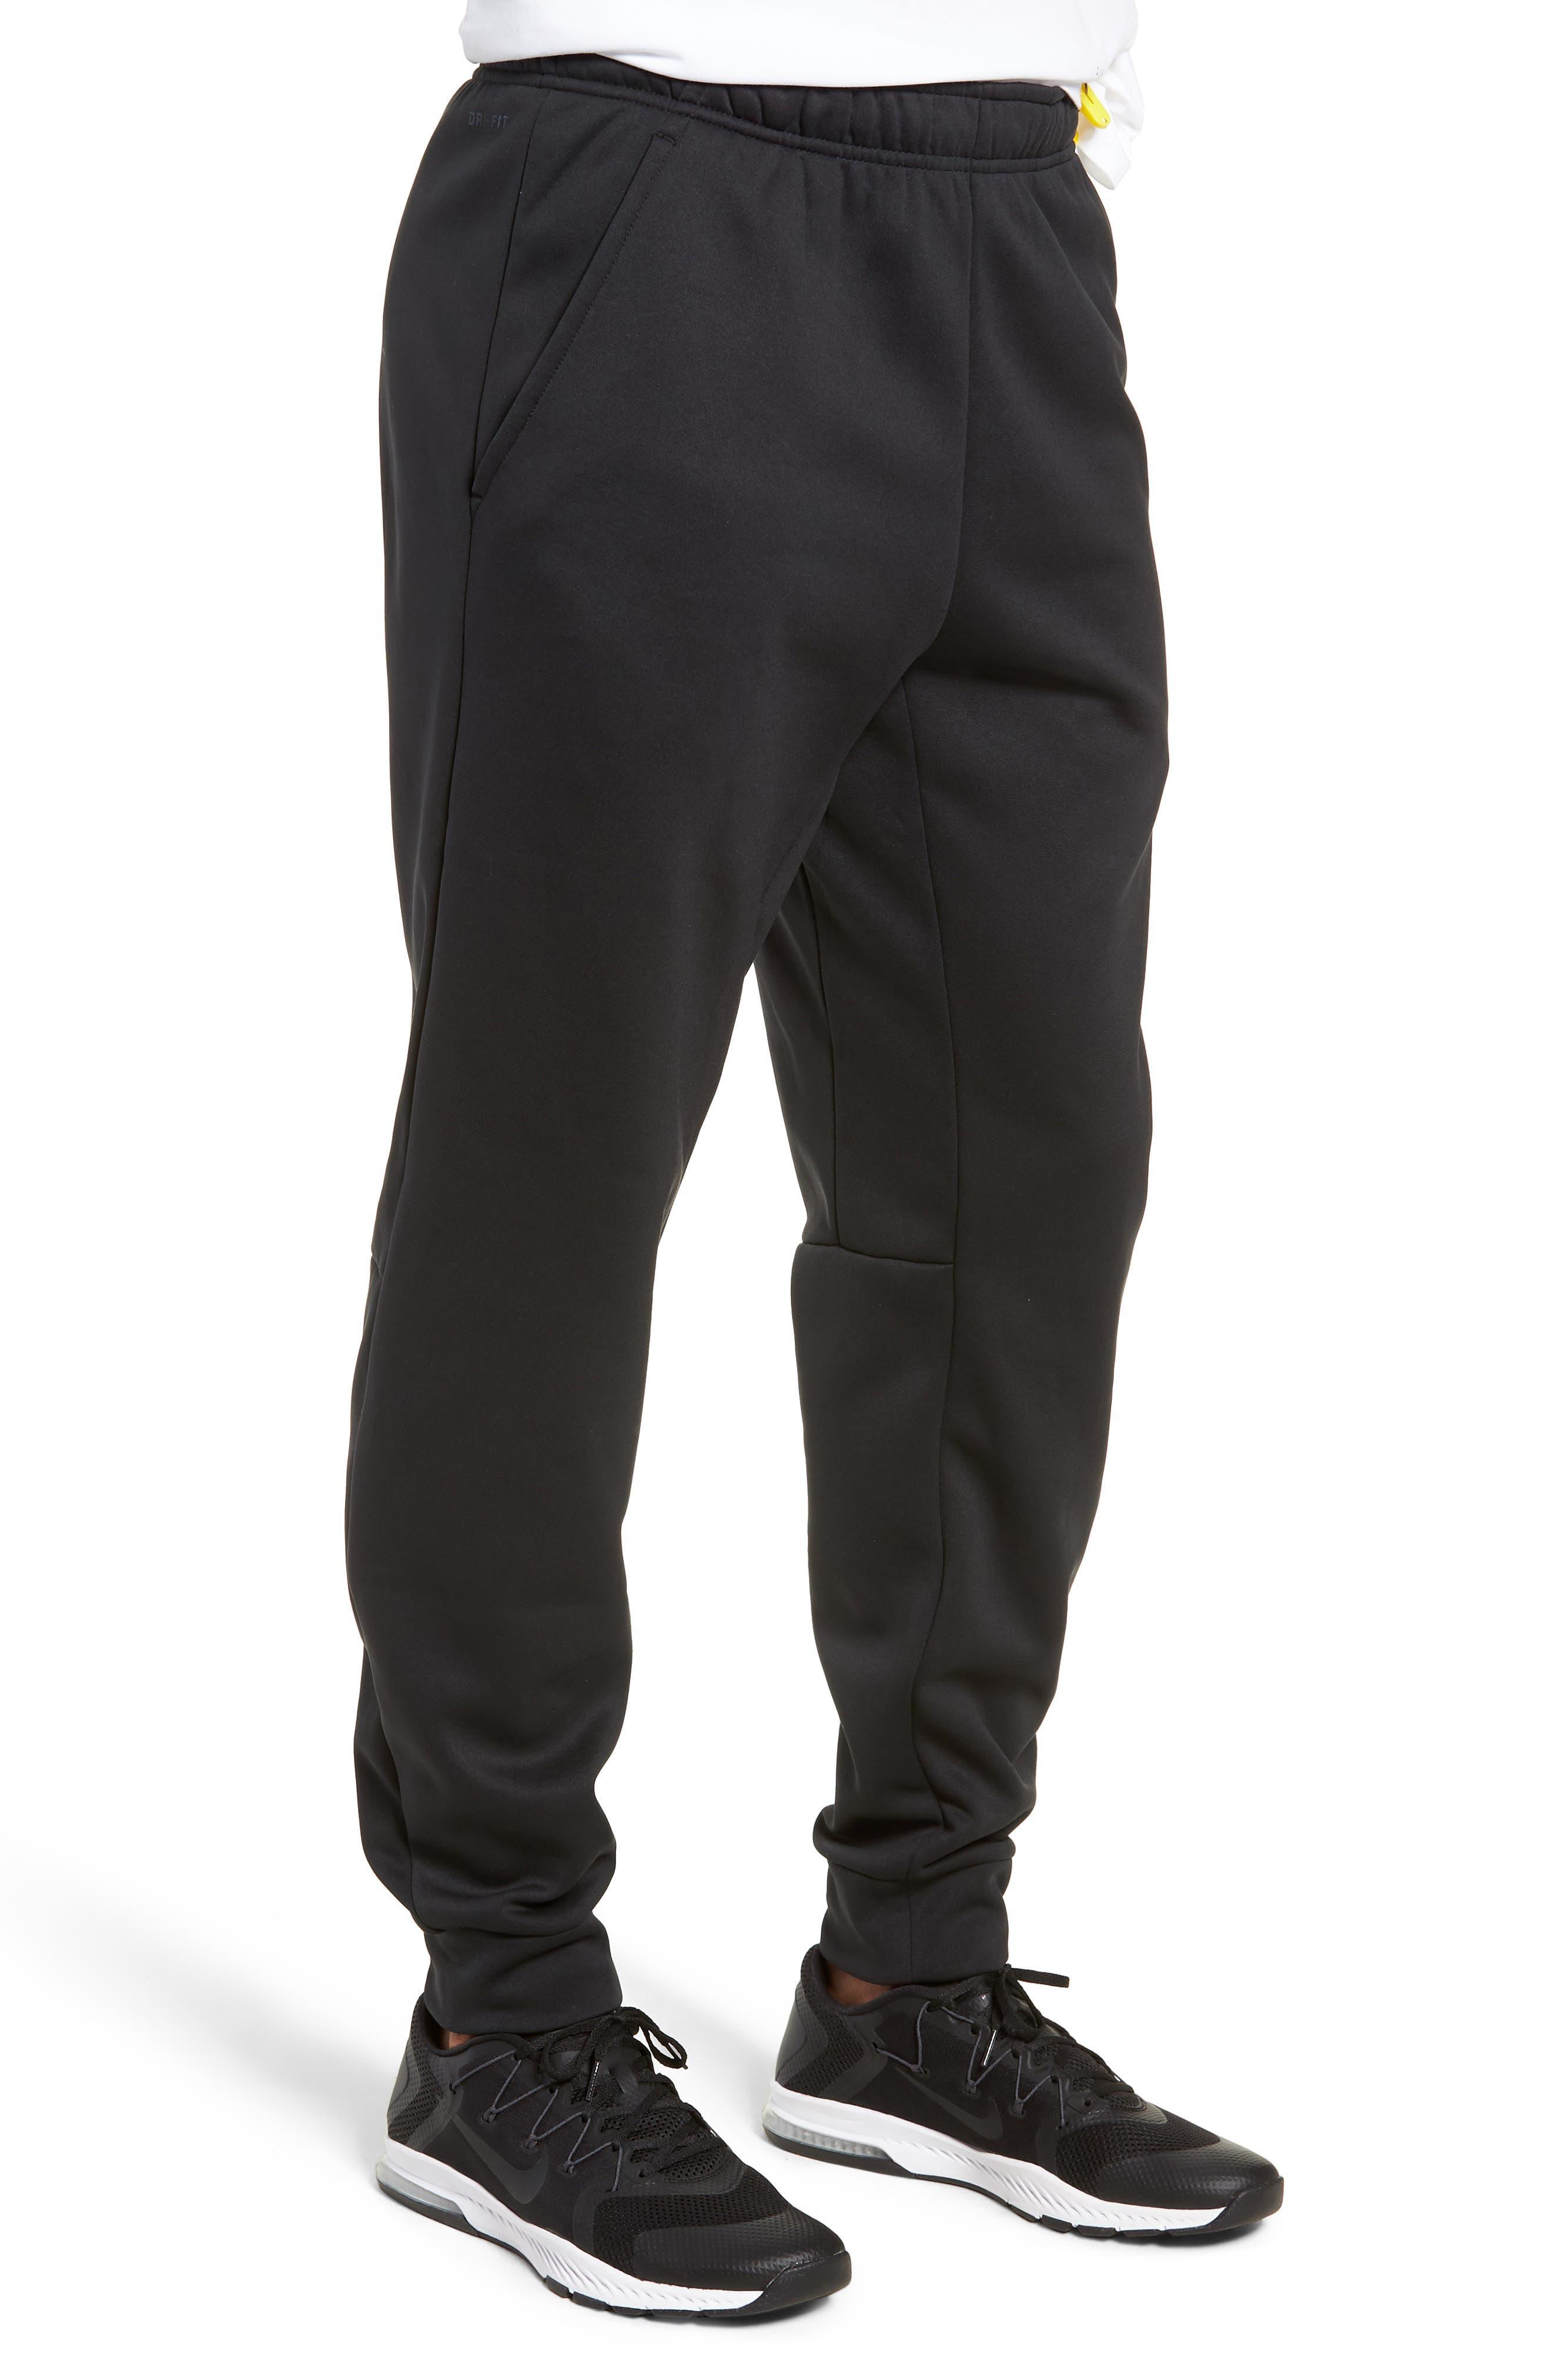 Therma Tapered Pants,                             Alternate thumbnail 3, color,                             BLACK/ WHITE